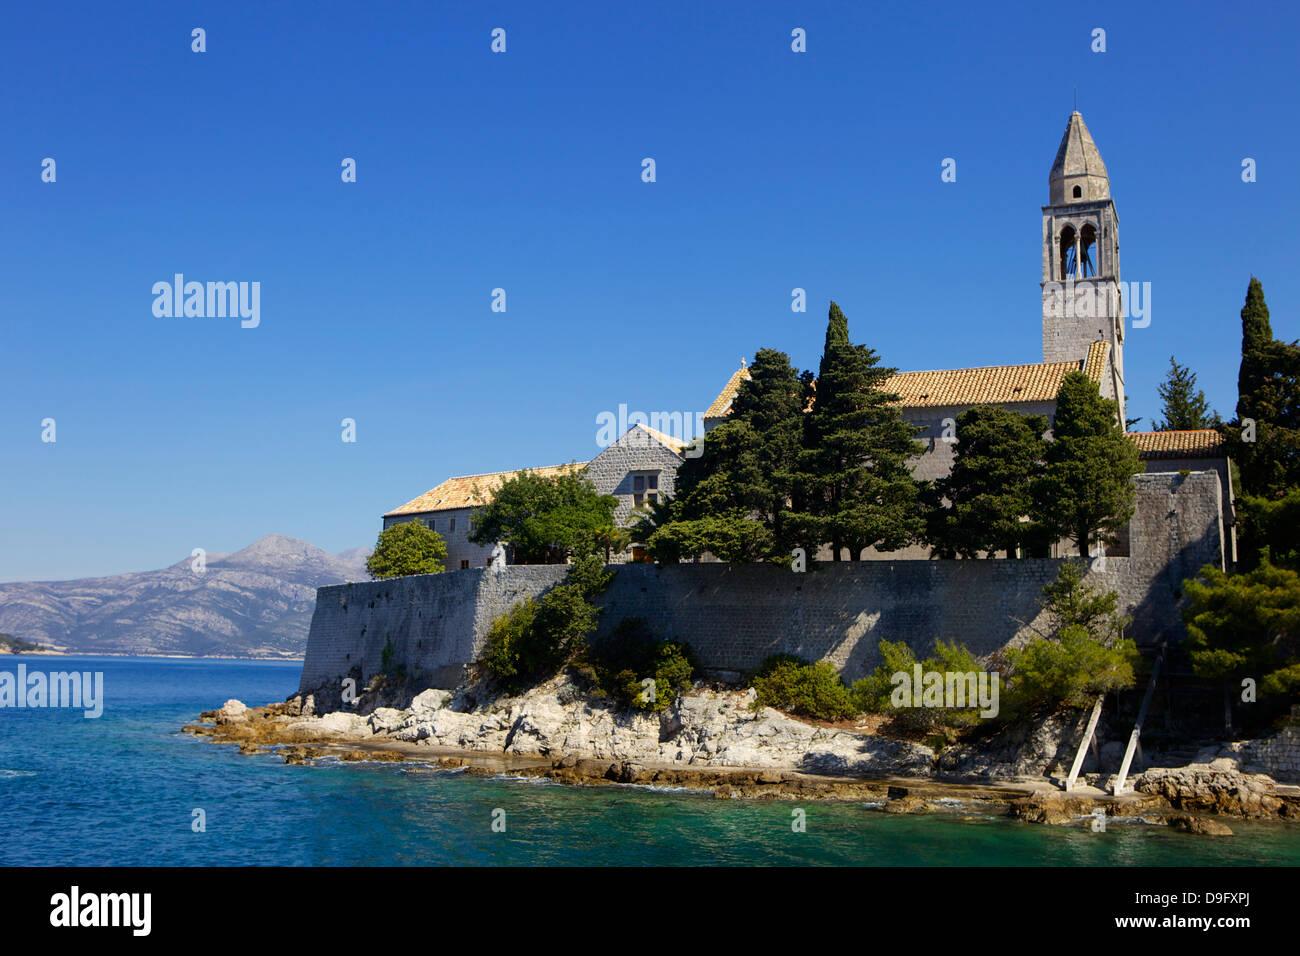 St. Mary's Church and Franciscan Monastery on the island of Lopud, South Dalmatia, Croatia Stock Photo